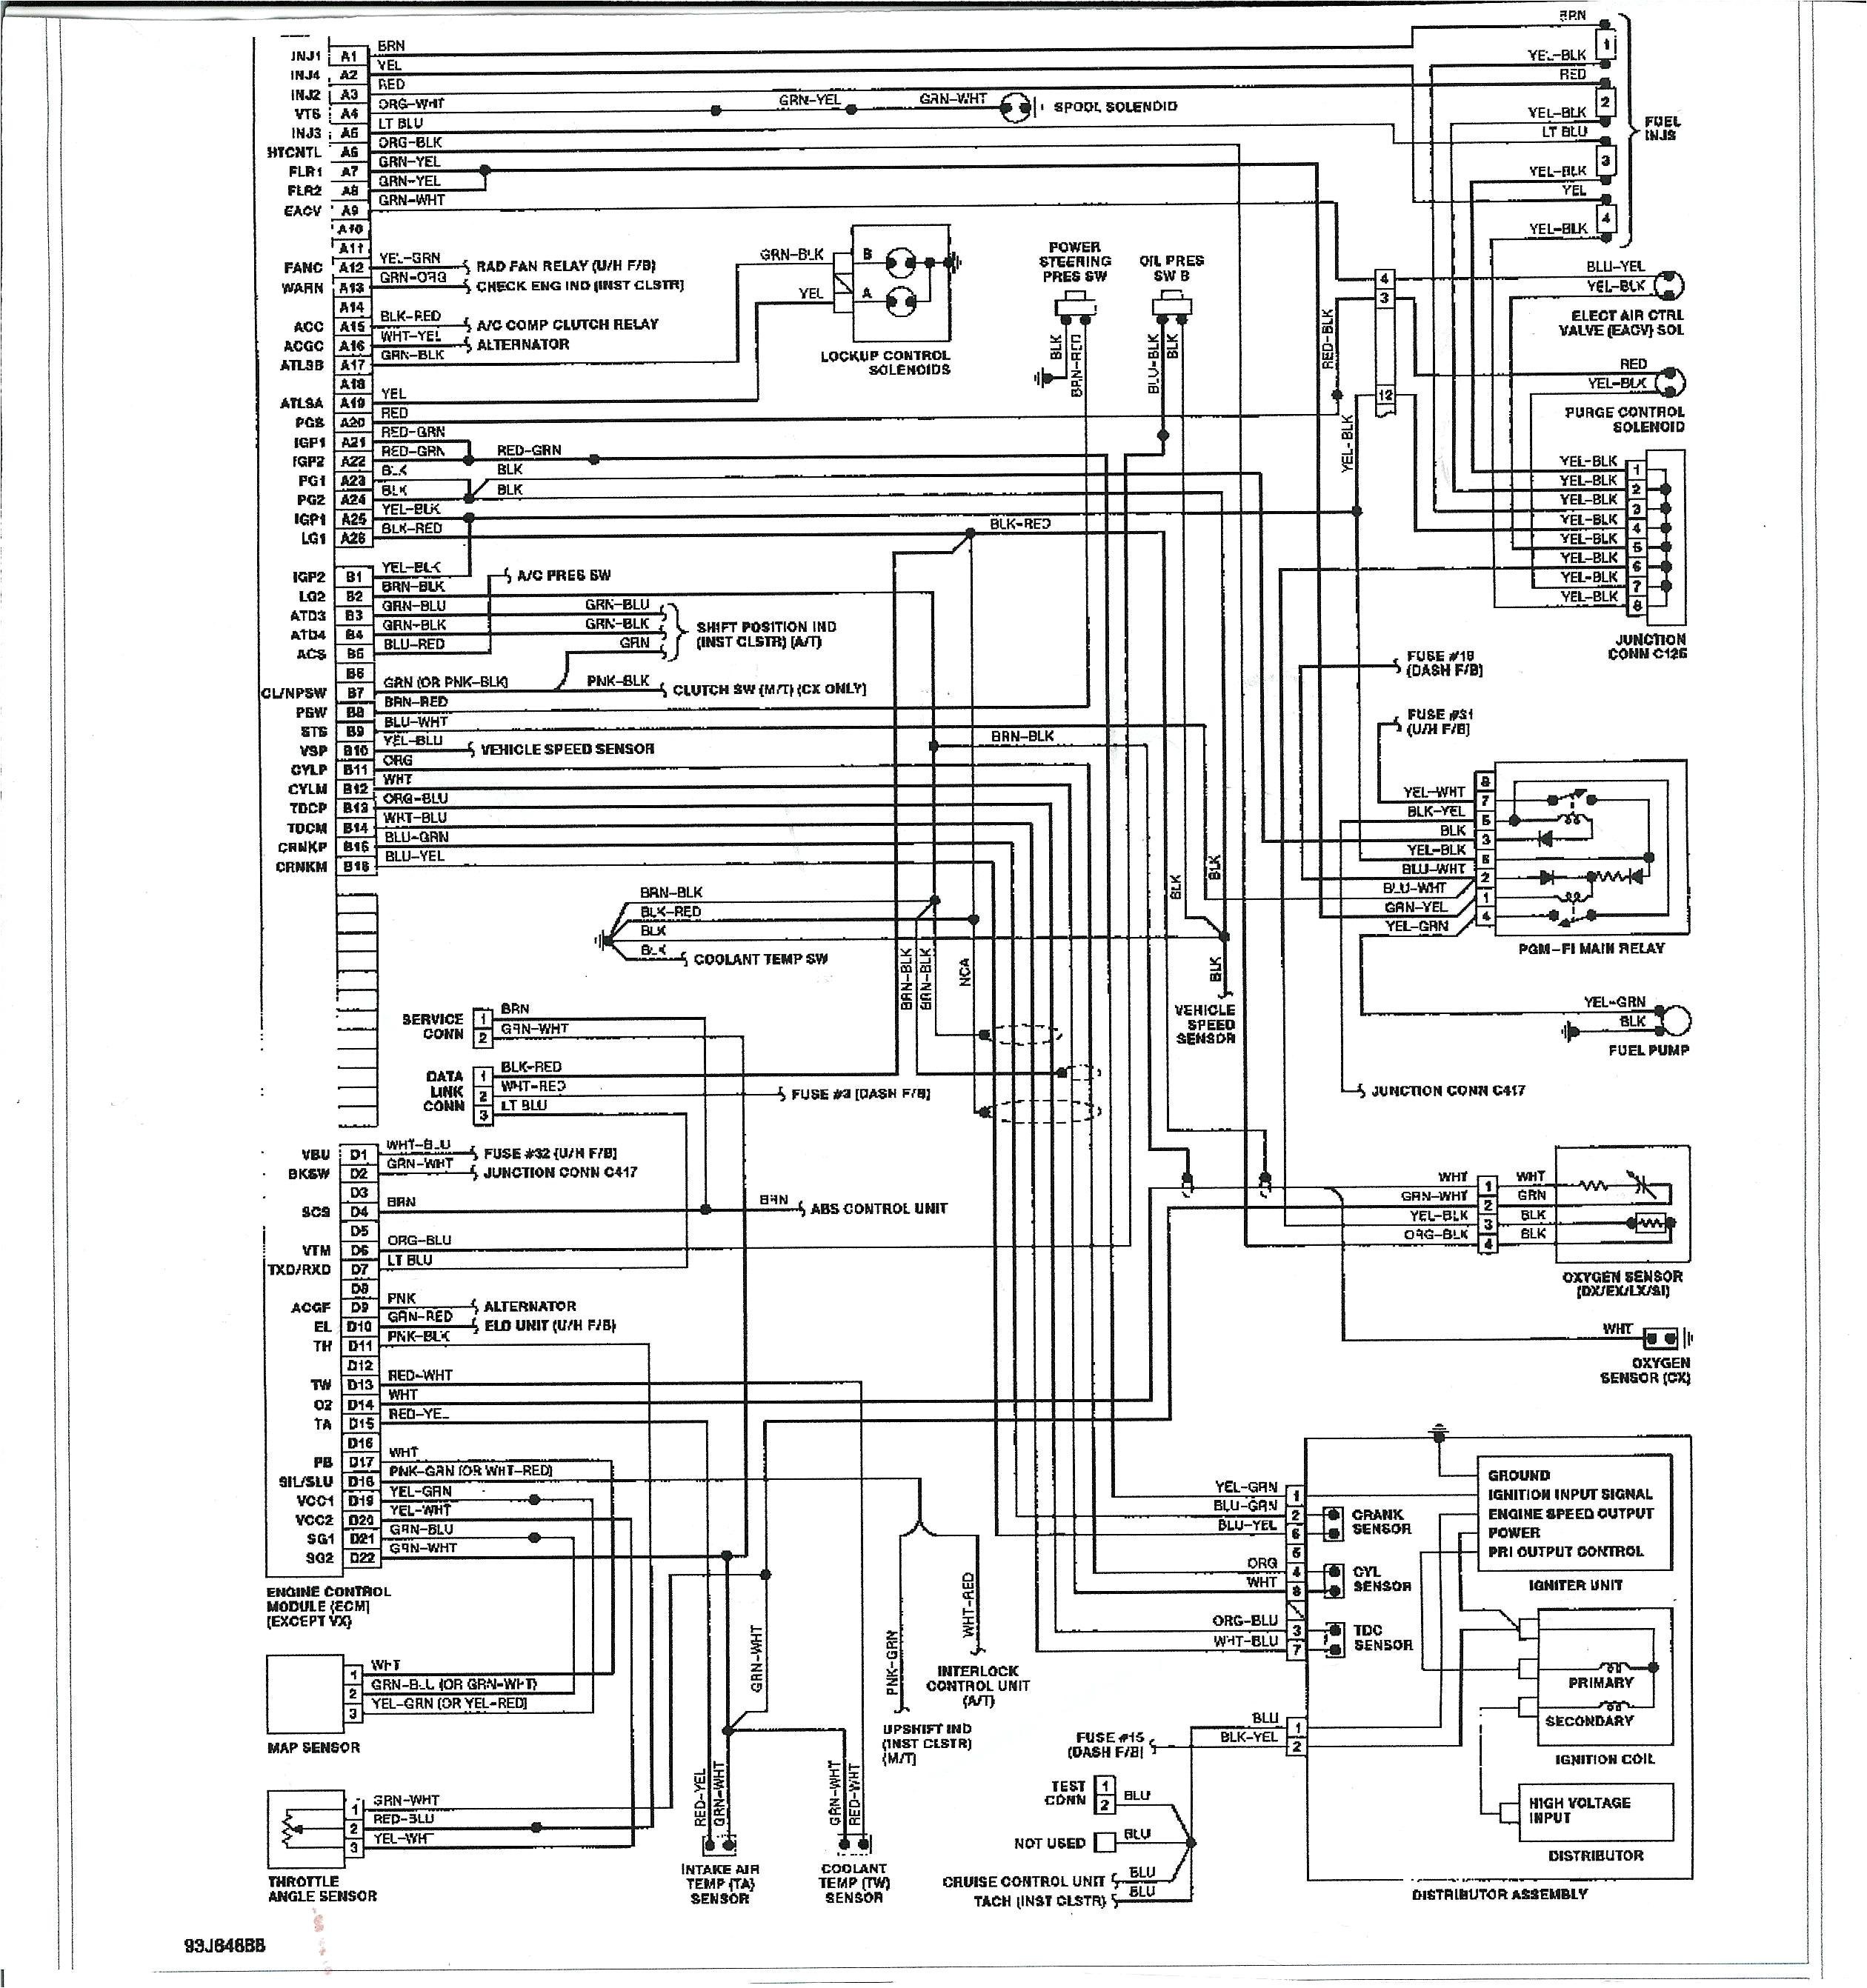 1995 Acura Integra Wiring Diagram 95 Acura Computer Wiring Diagram Home Wiring Diagram